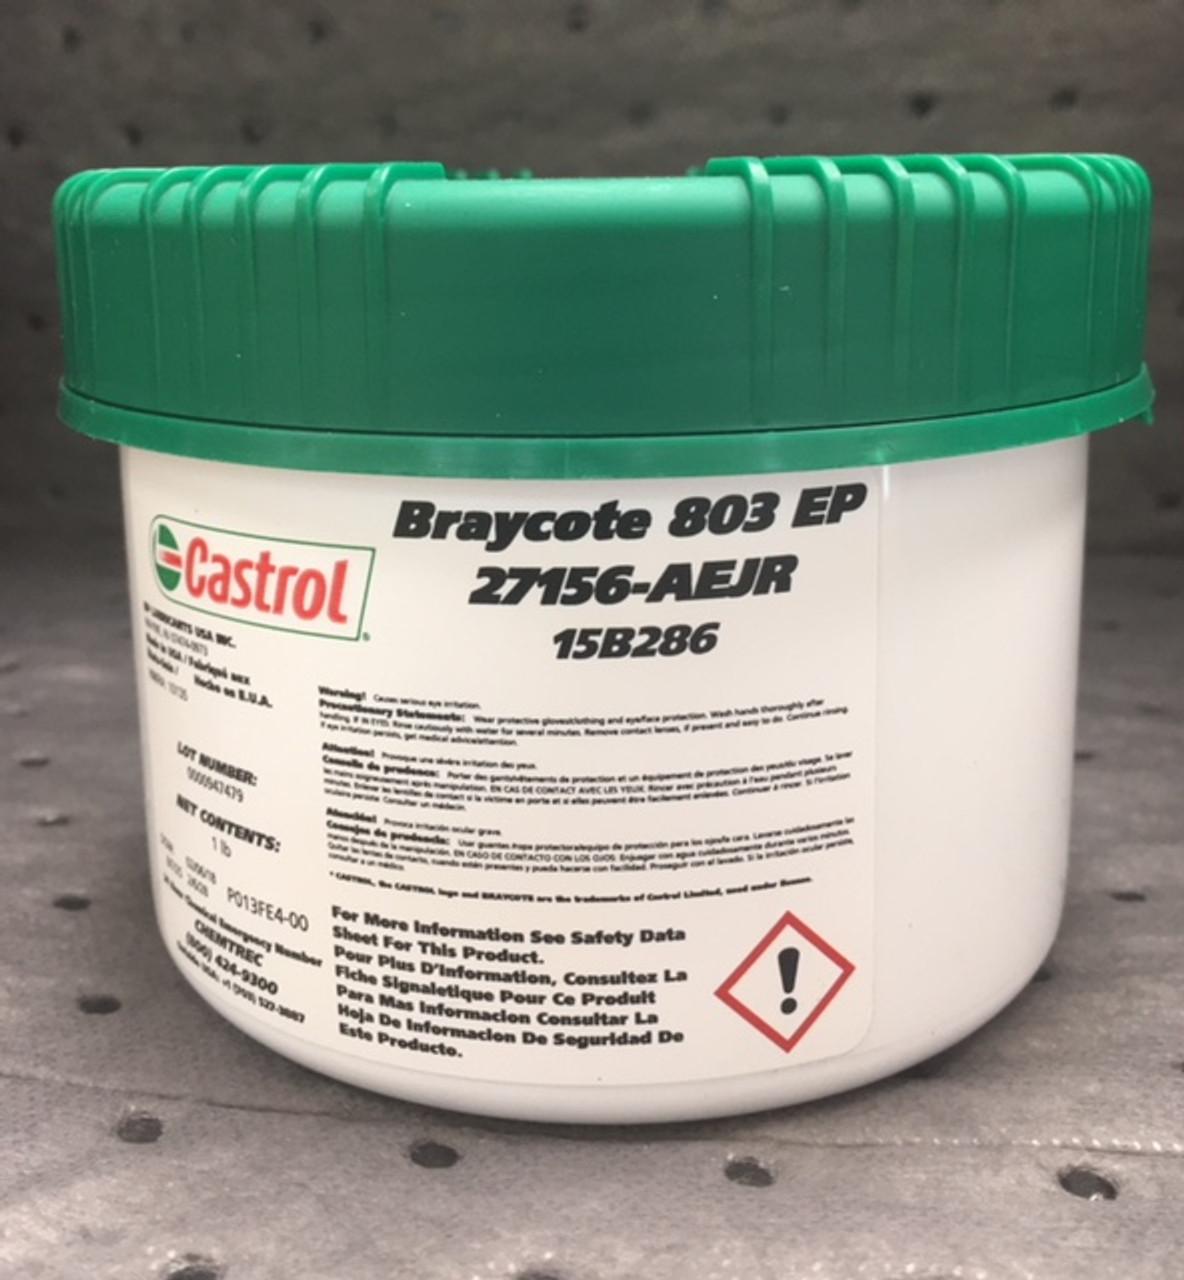 Castrol Braycote 803 EP | 1 LB Jar